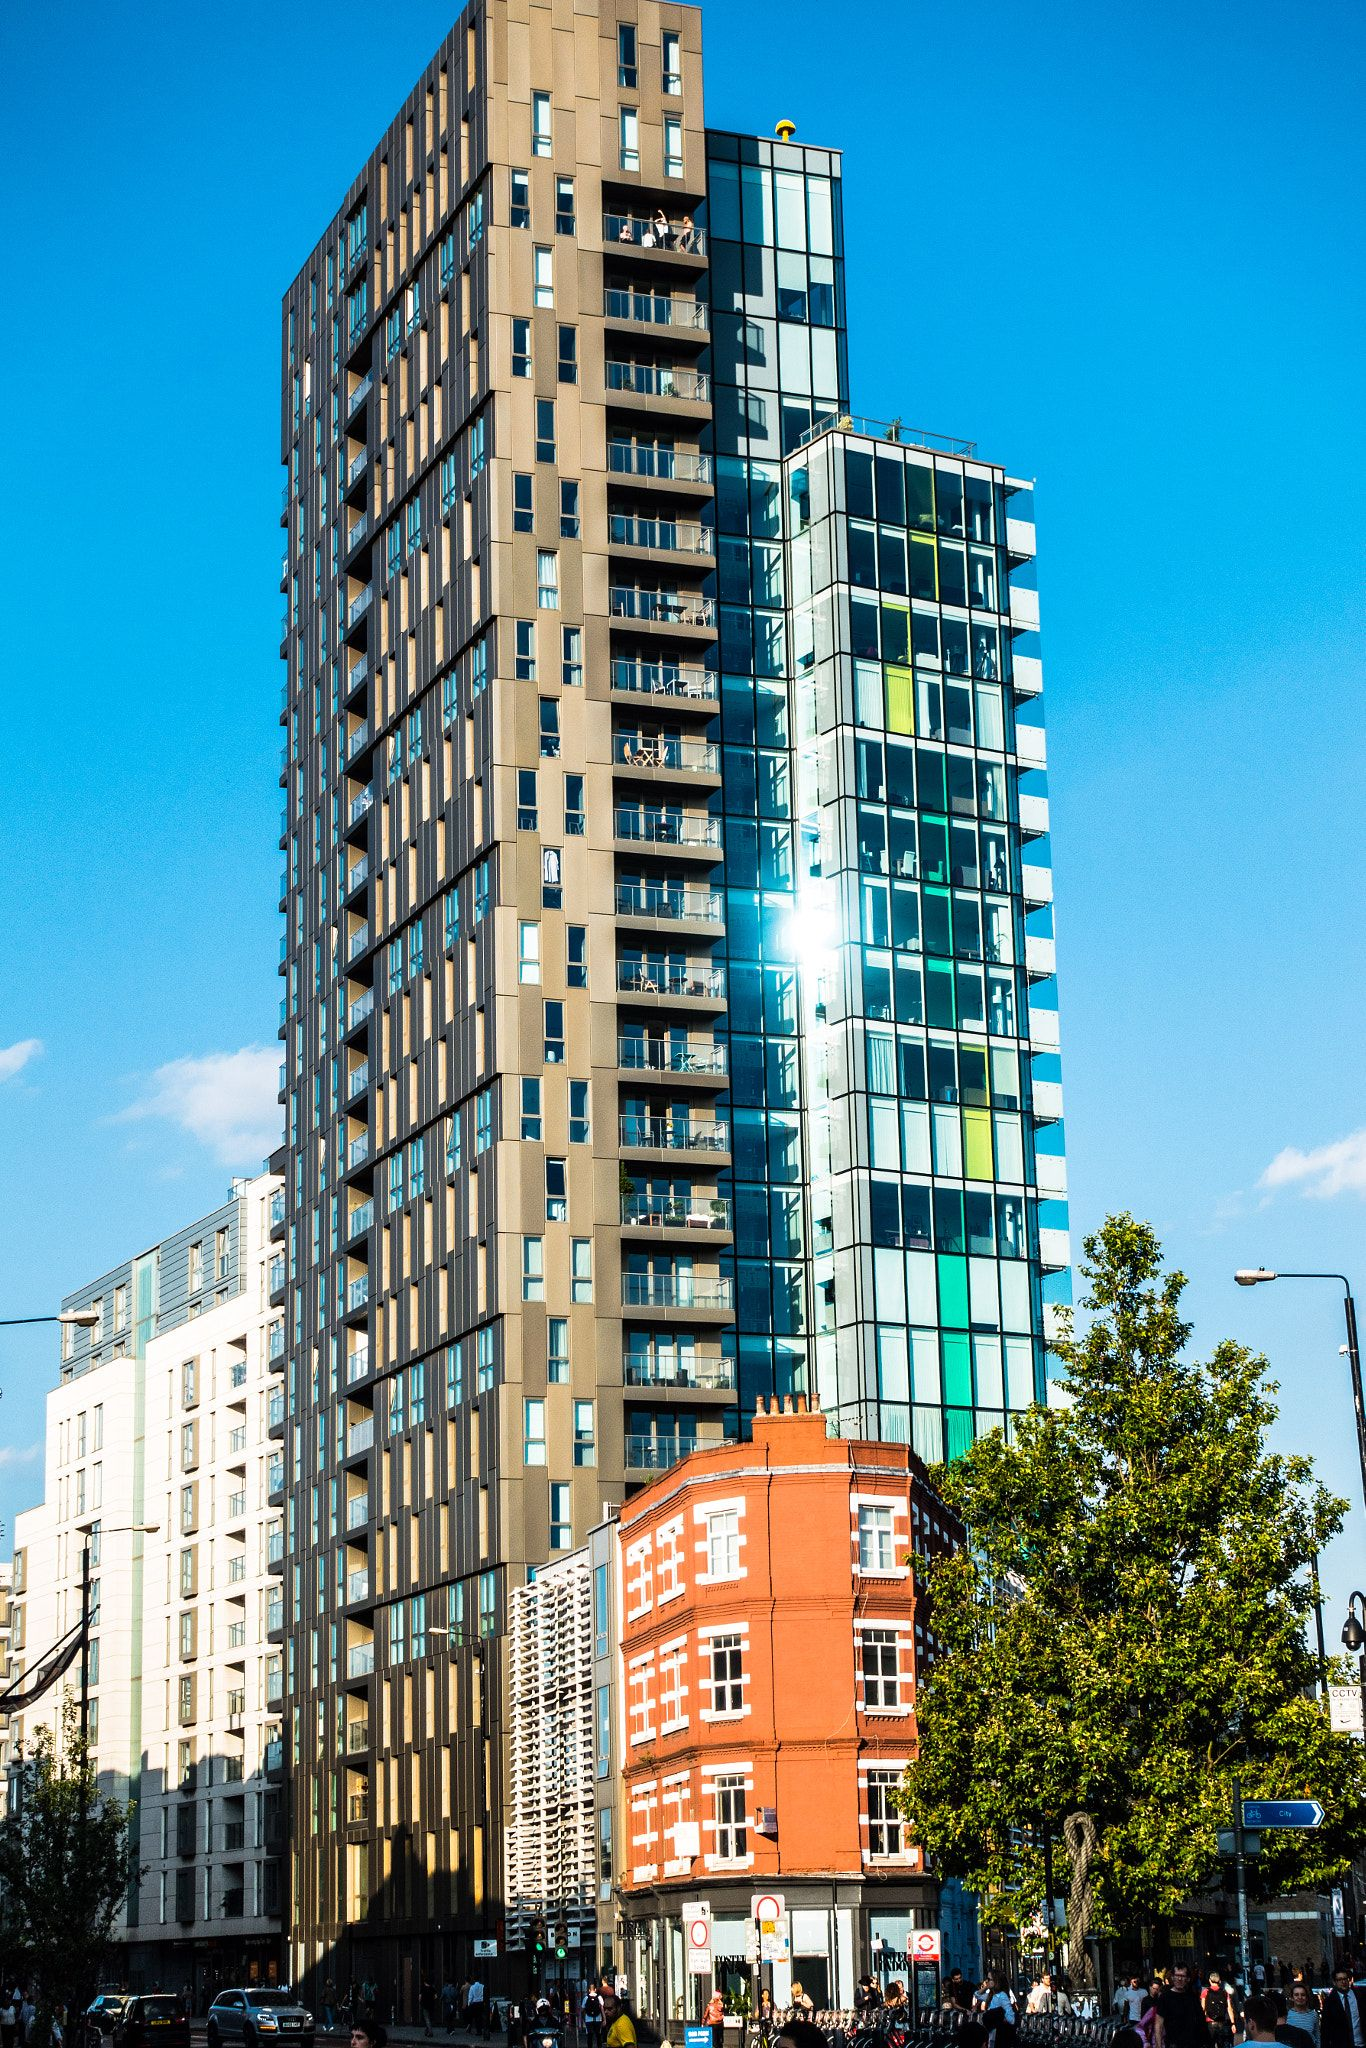 Shoreditch England: Apartment Block In Shoreditch, London